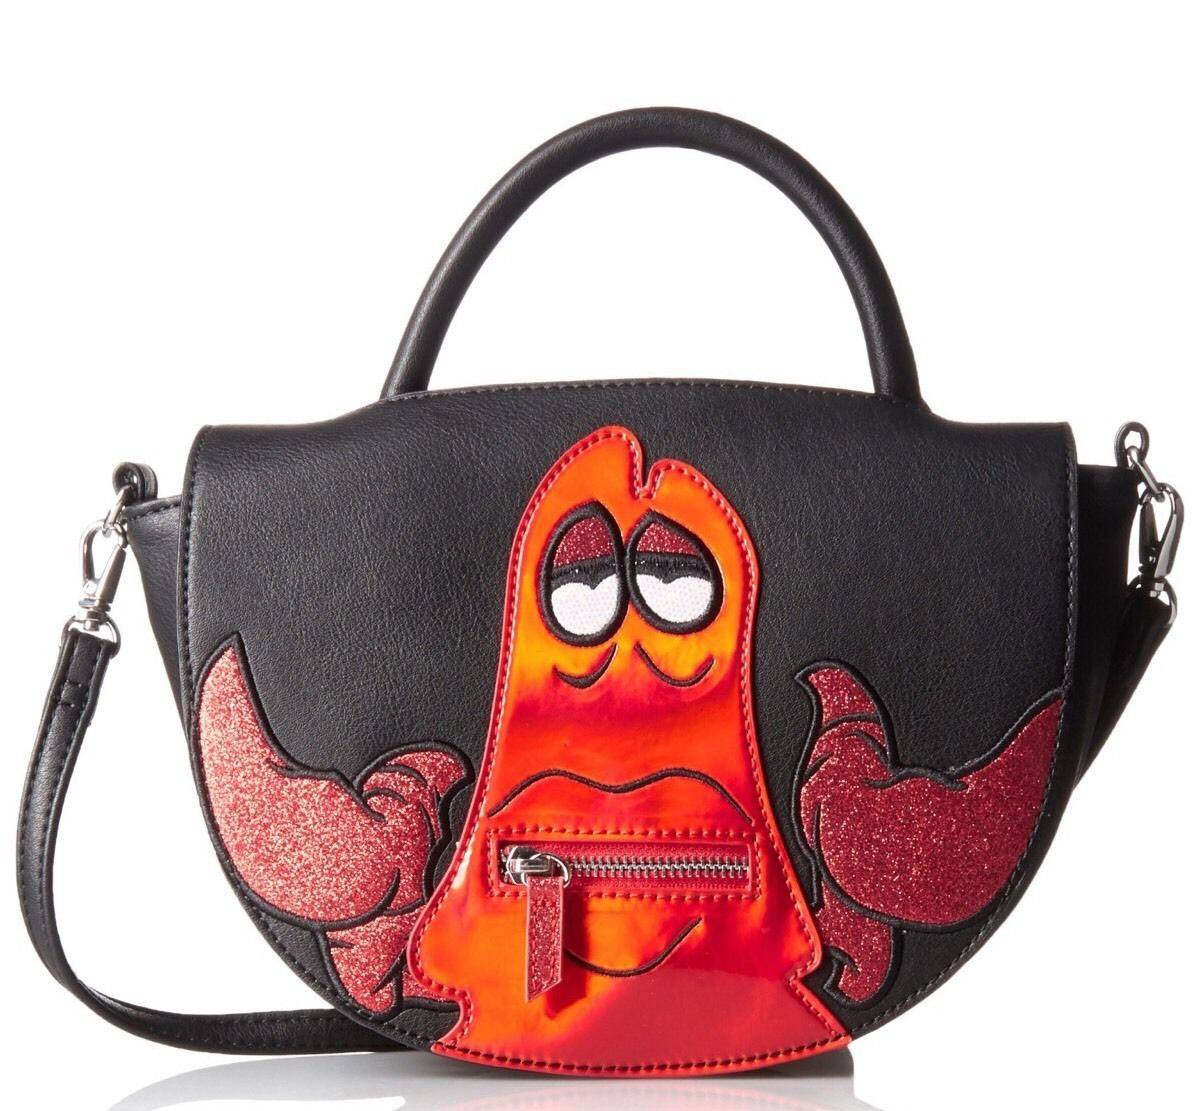 Disney by Danielle Nicole Saddle Handbag Sebastian (The Little Mermaid)